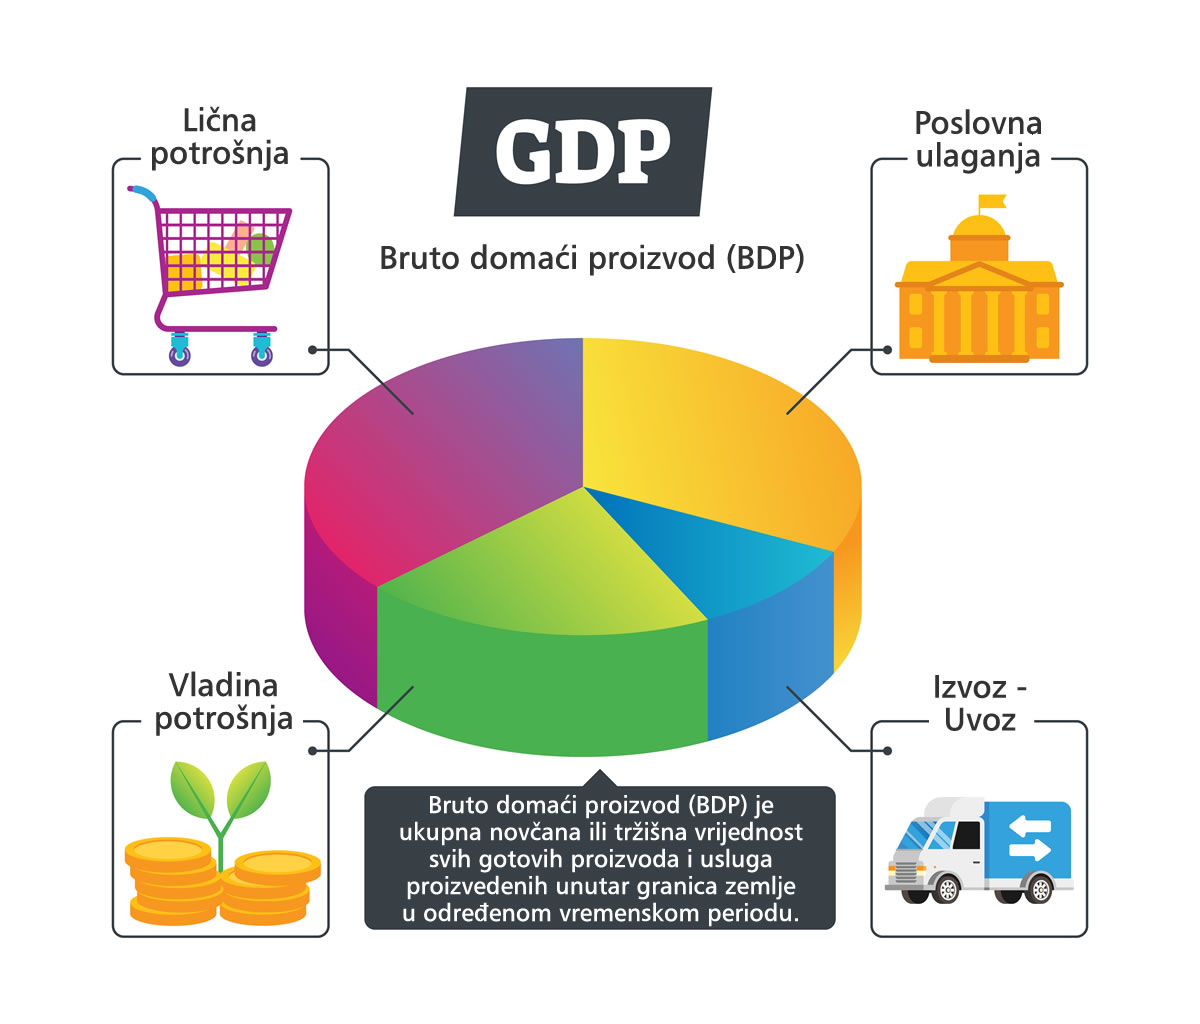 GDP 2017